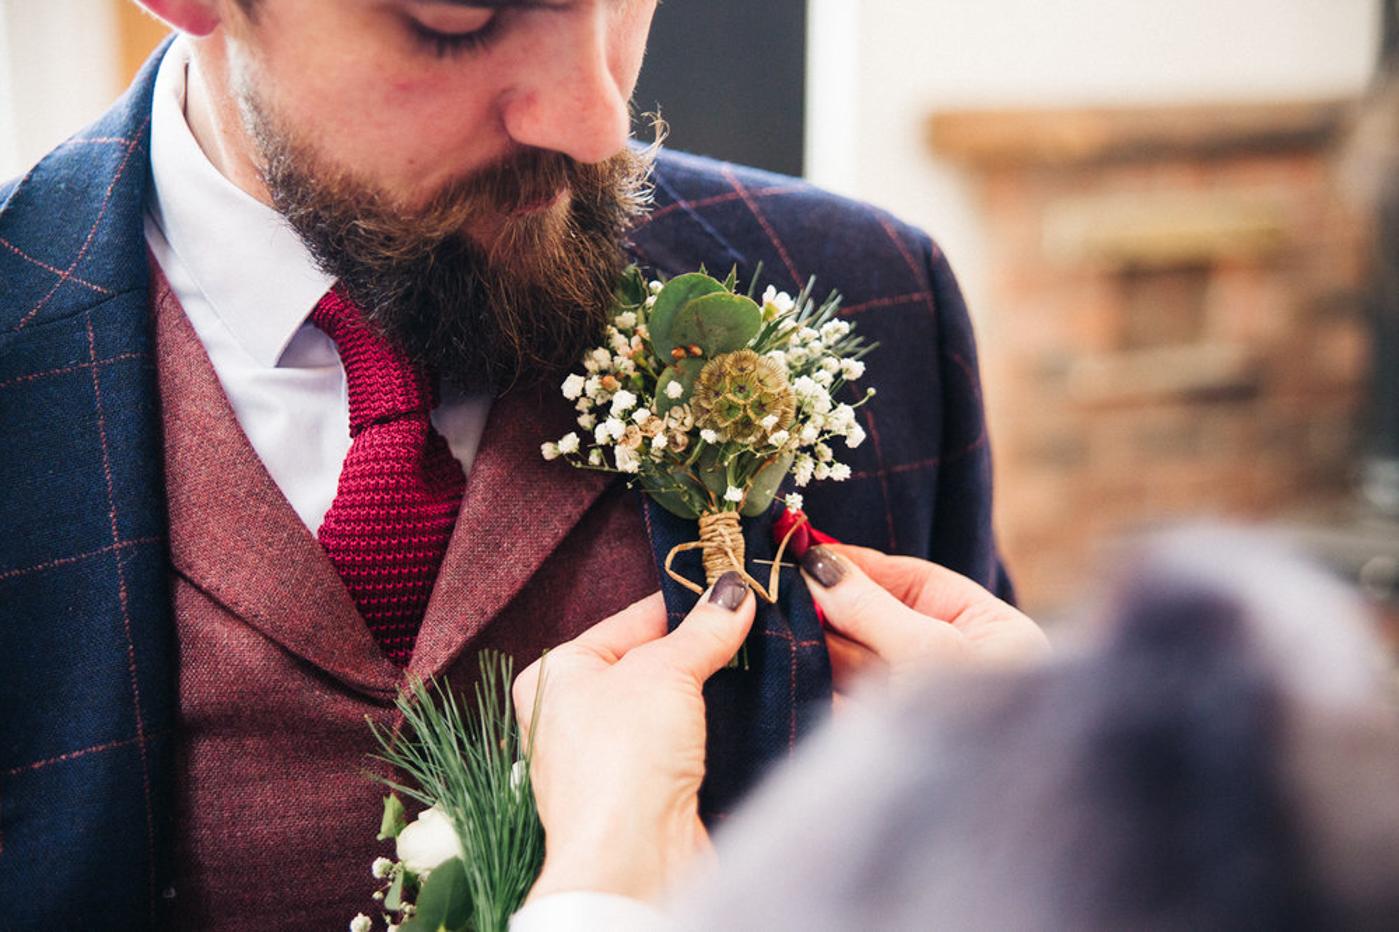 teesside-middlesbrough-north-east-wedding-photographer-creative-wedding-venues-0017.jpg